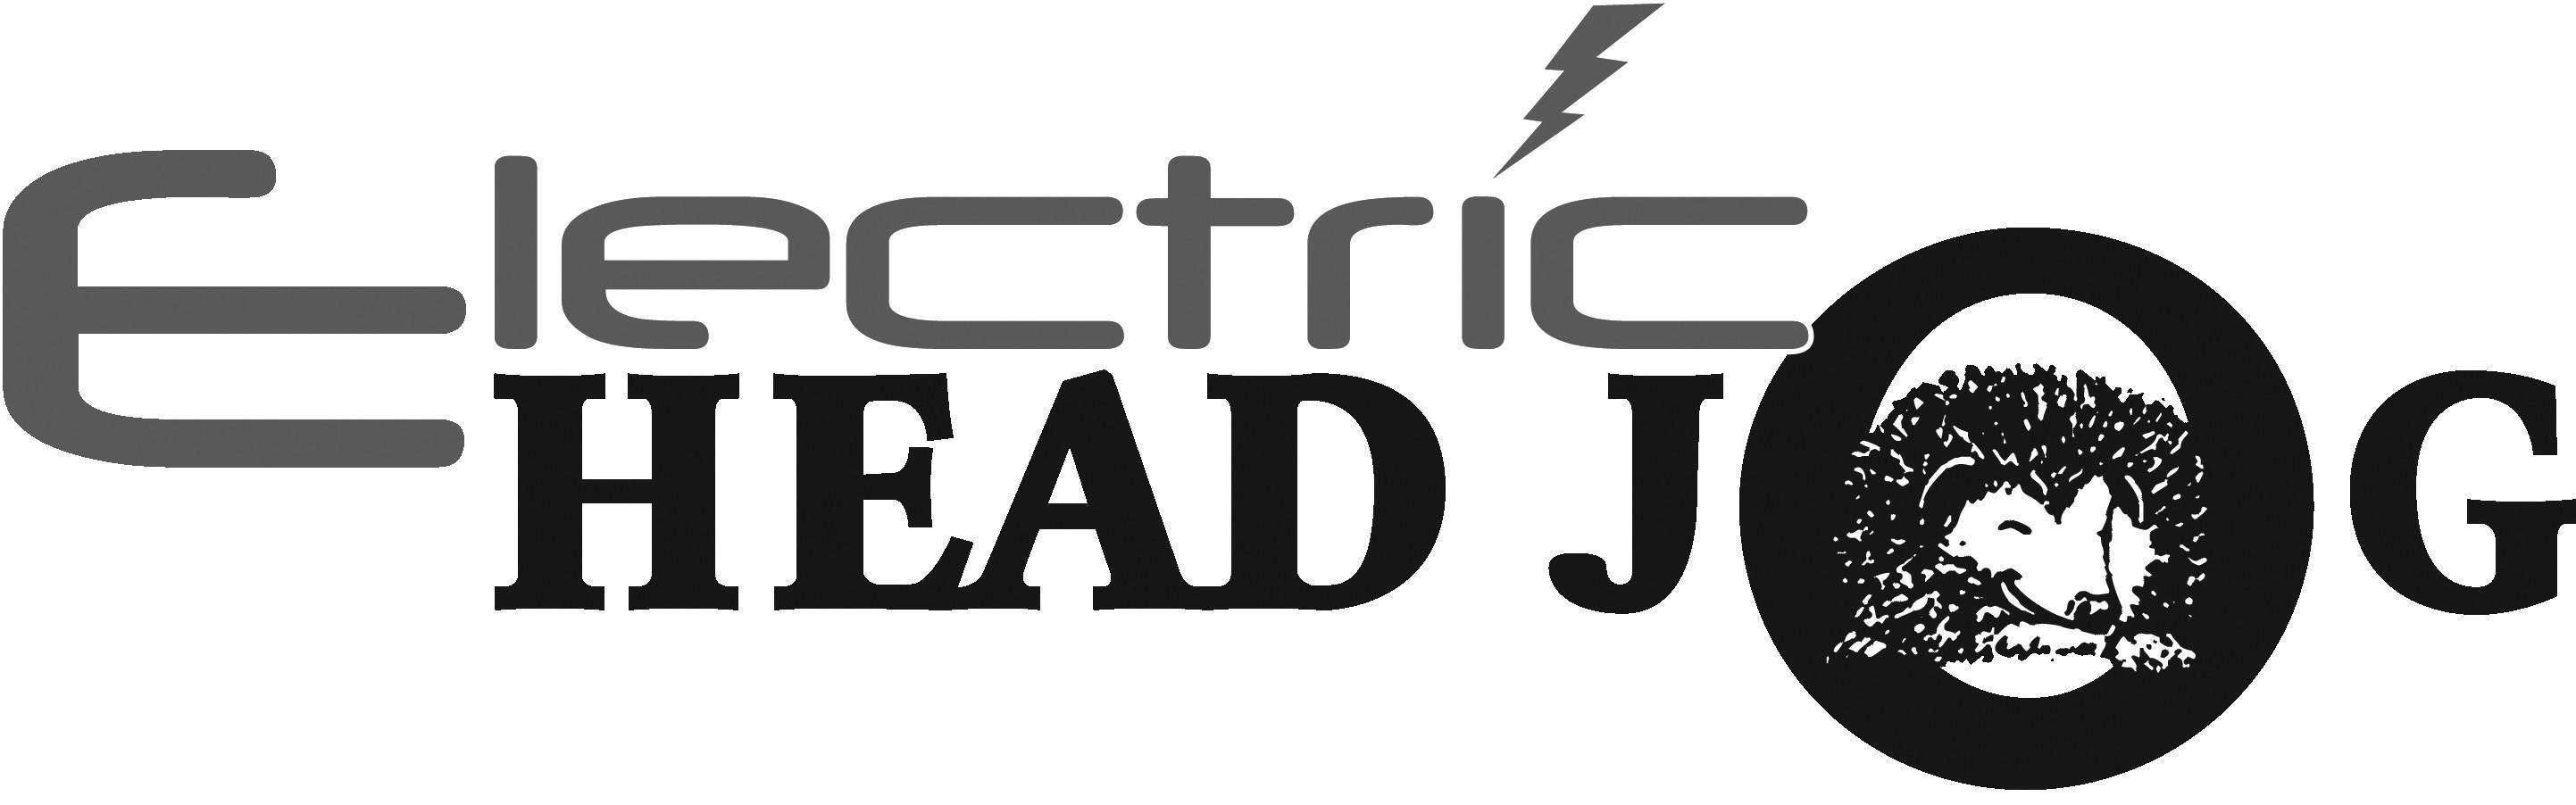 Electric Head Jog